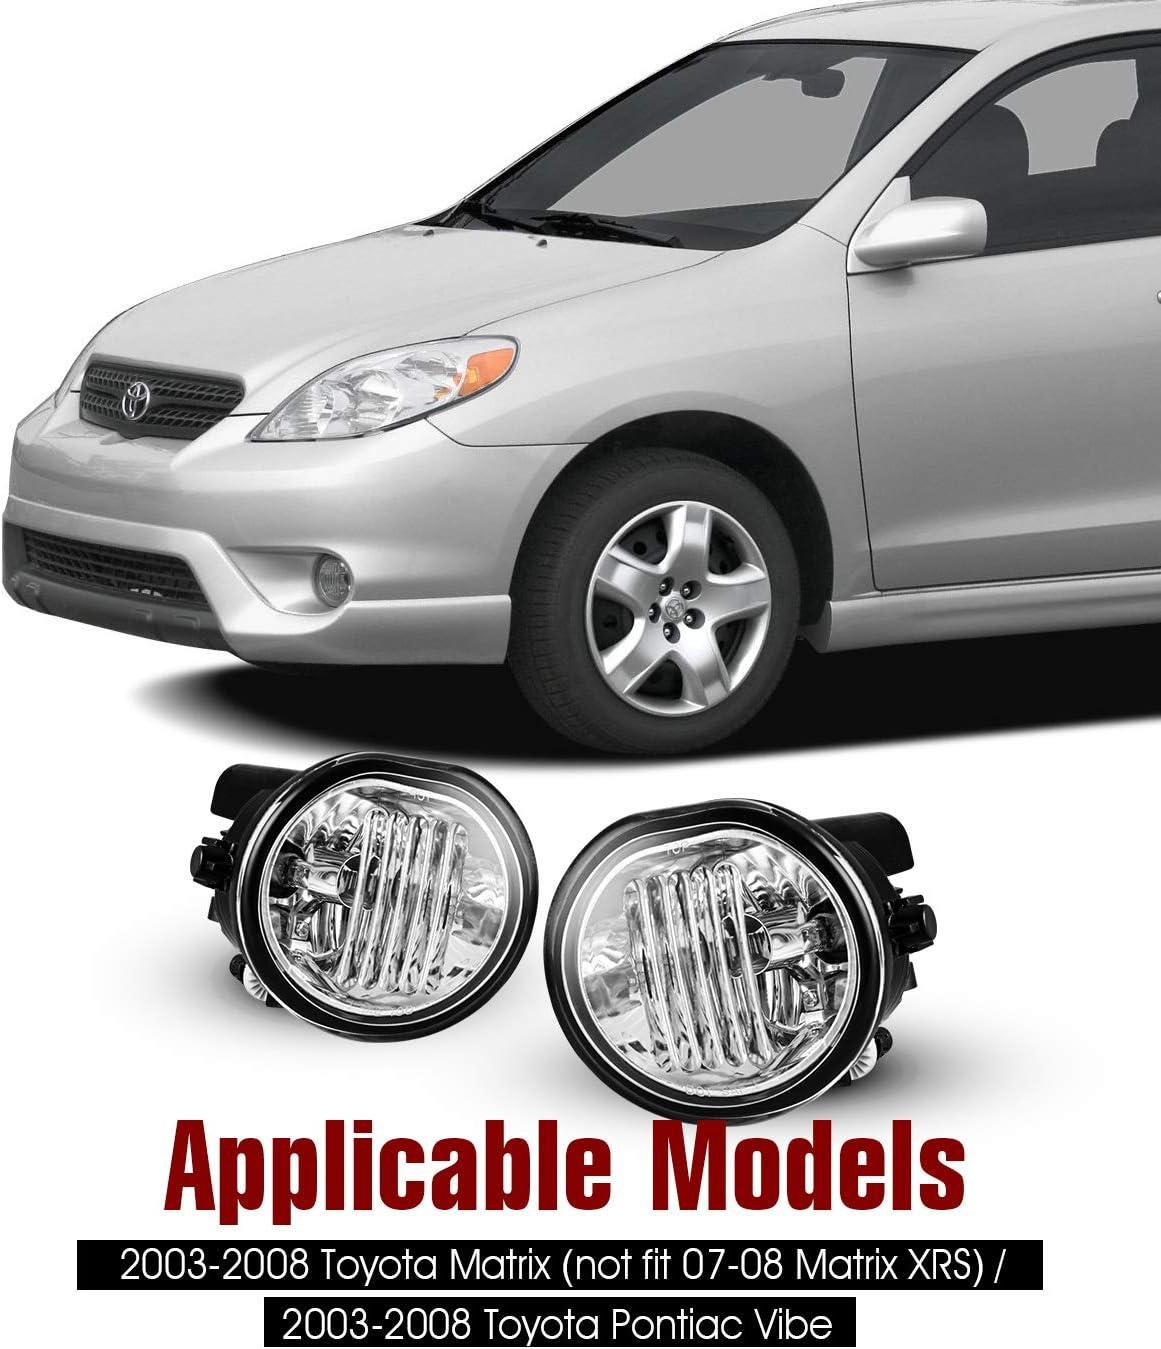 For Toyota Matrix 2003-2008 6x Combo 9005 9006 9006 LED Headlight Fog Light Bulb